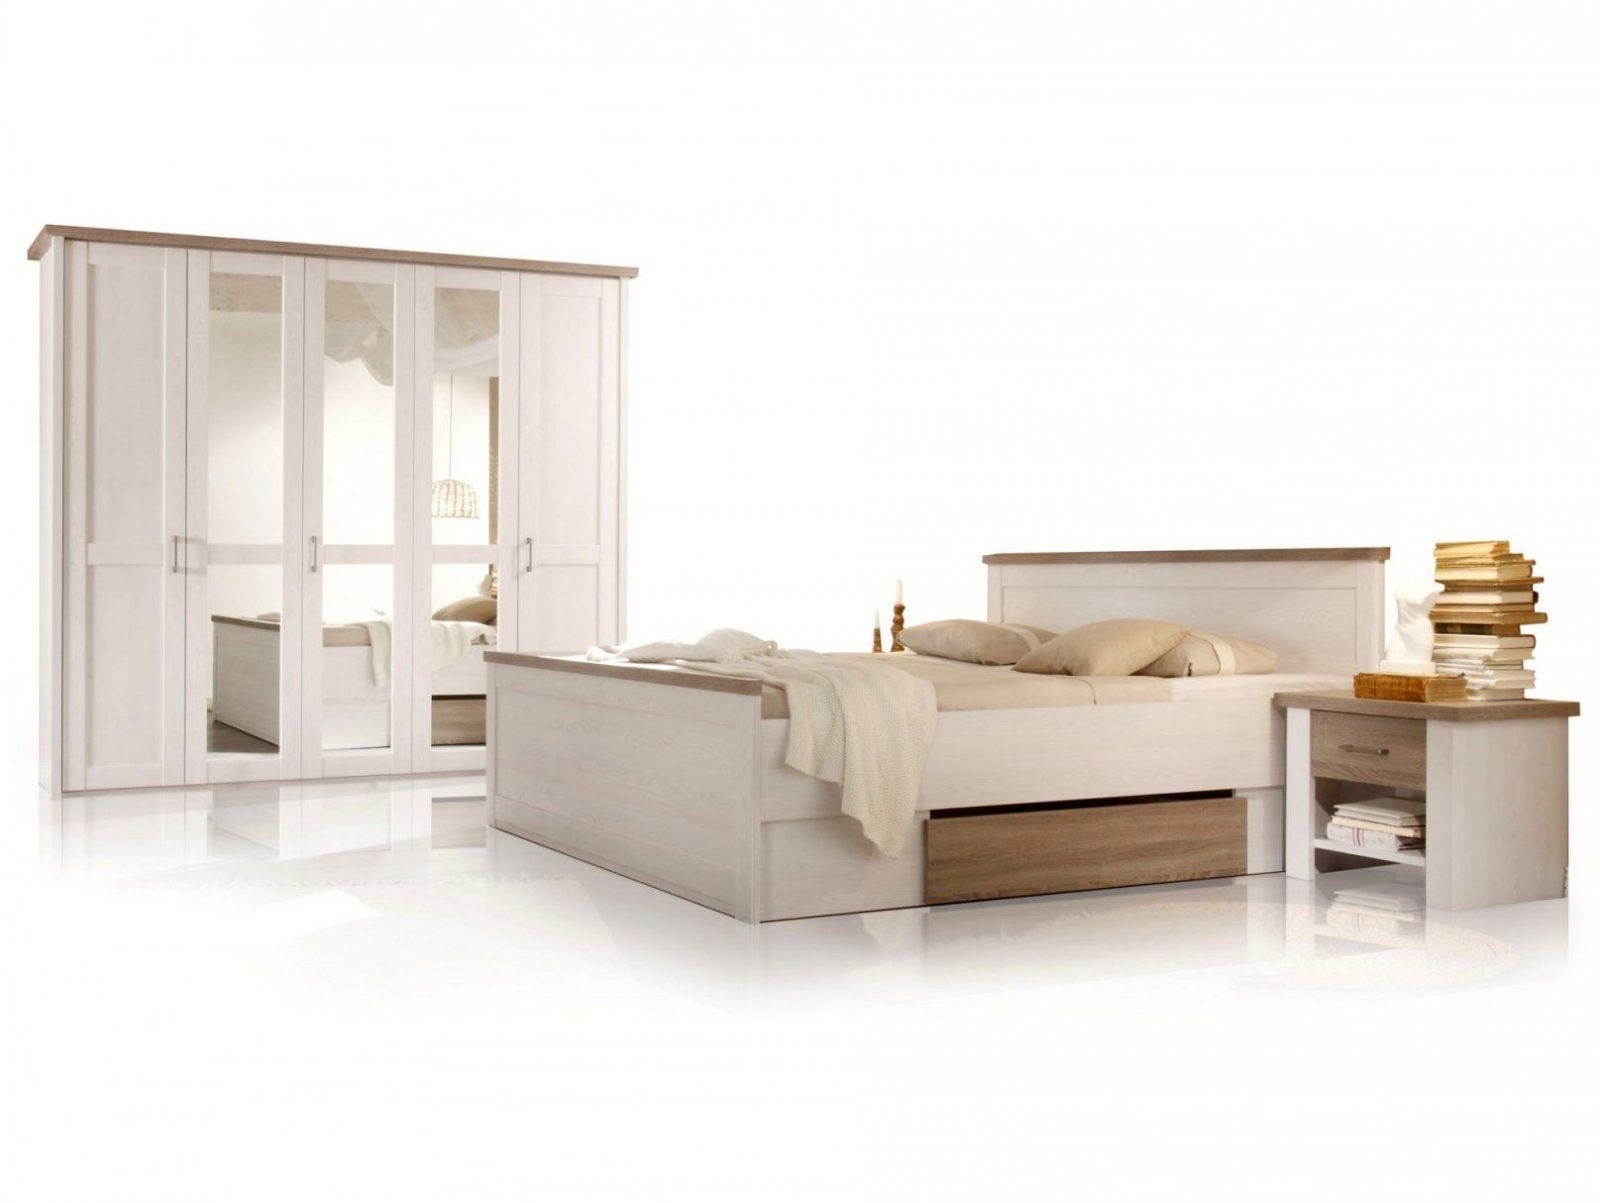 Groß Wohnkultur Möbel Boss Angebote Schlafzimmer Mobelr Moebel von Möbel Boss Schlafzimmer Komplett Photo